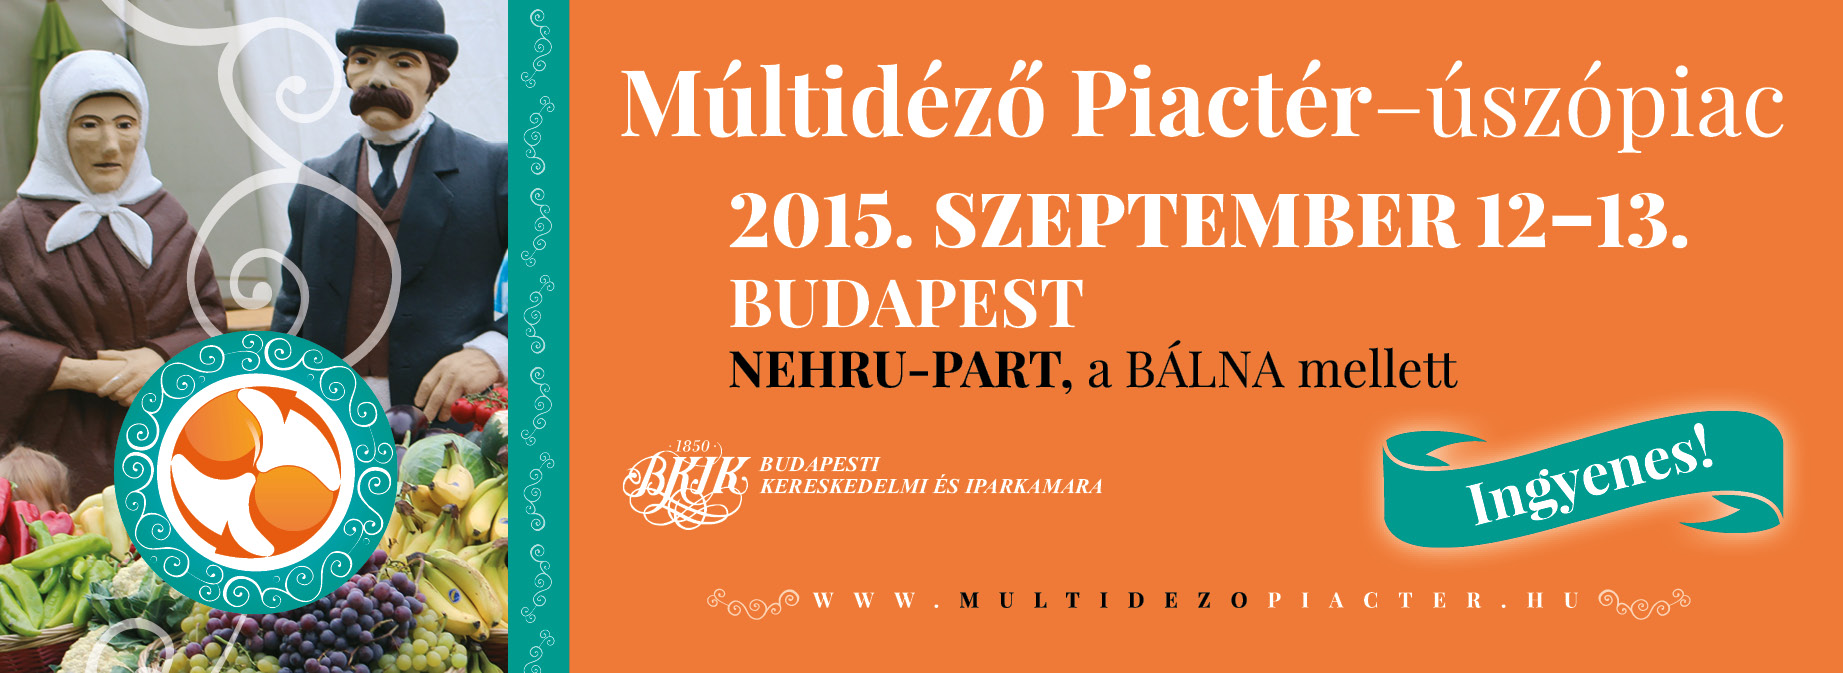 mp2015_meretezheto_minta1.jpg